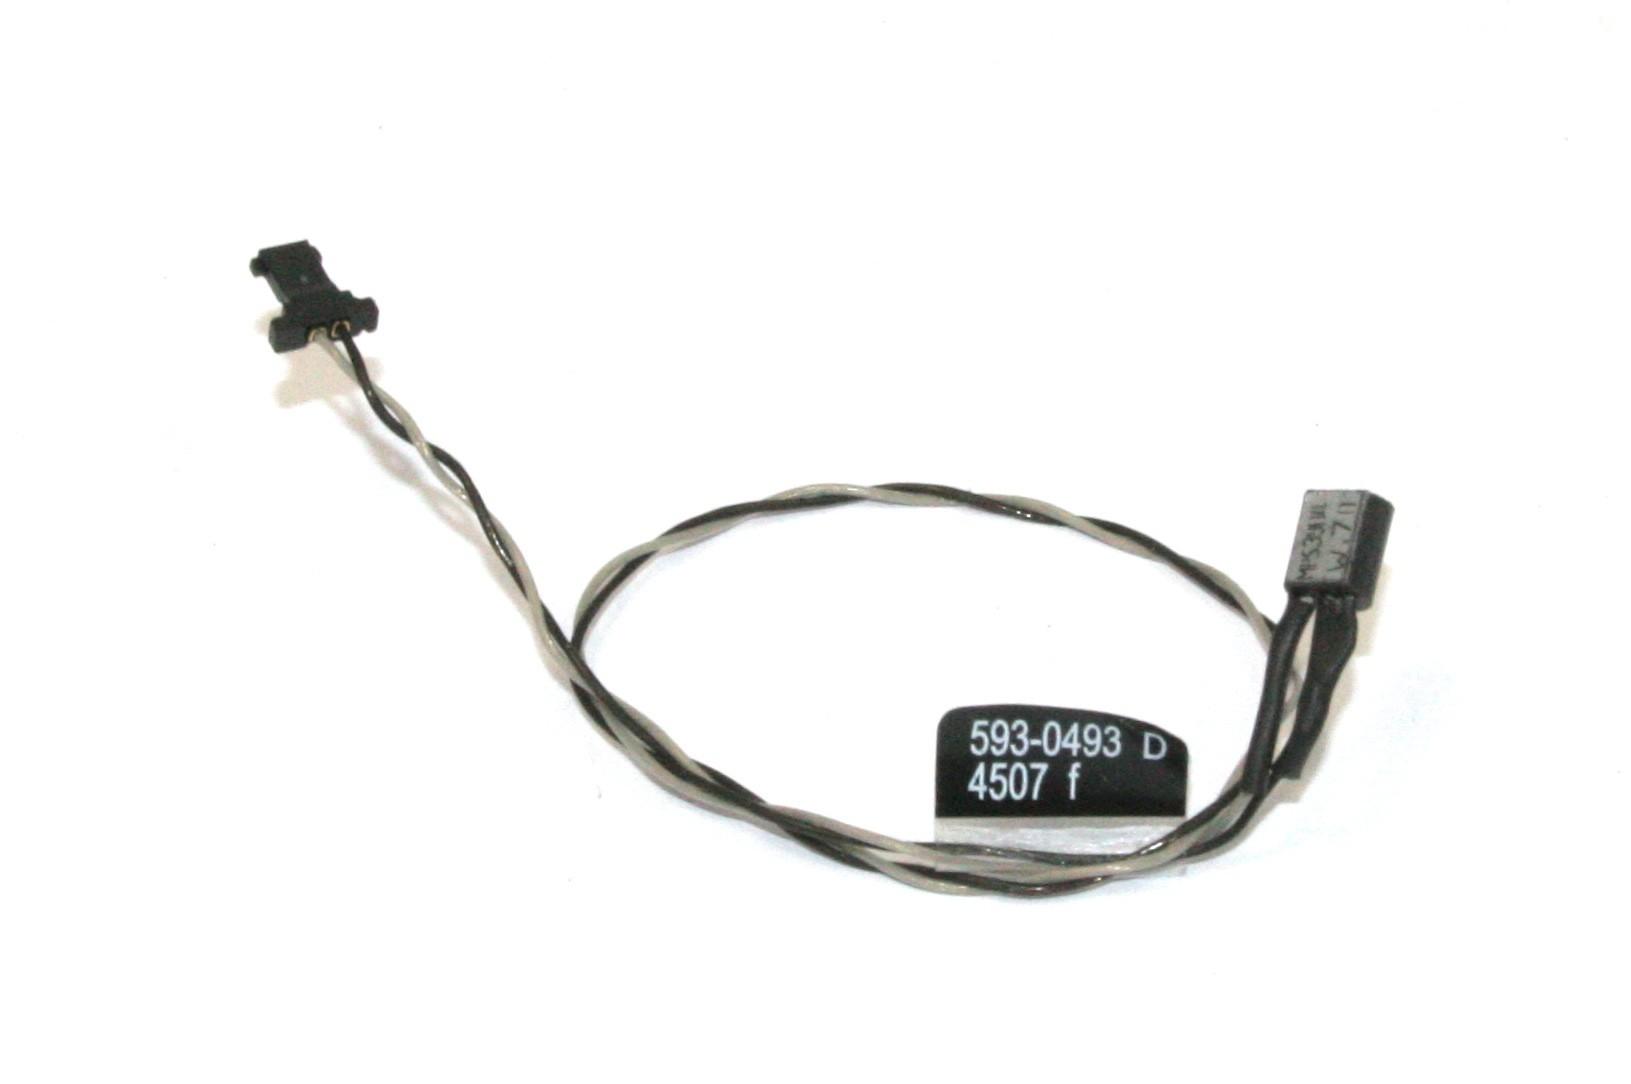 Thermal Sensor for iMac 2009-2011 Hard Drive Upgrade